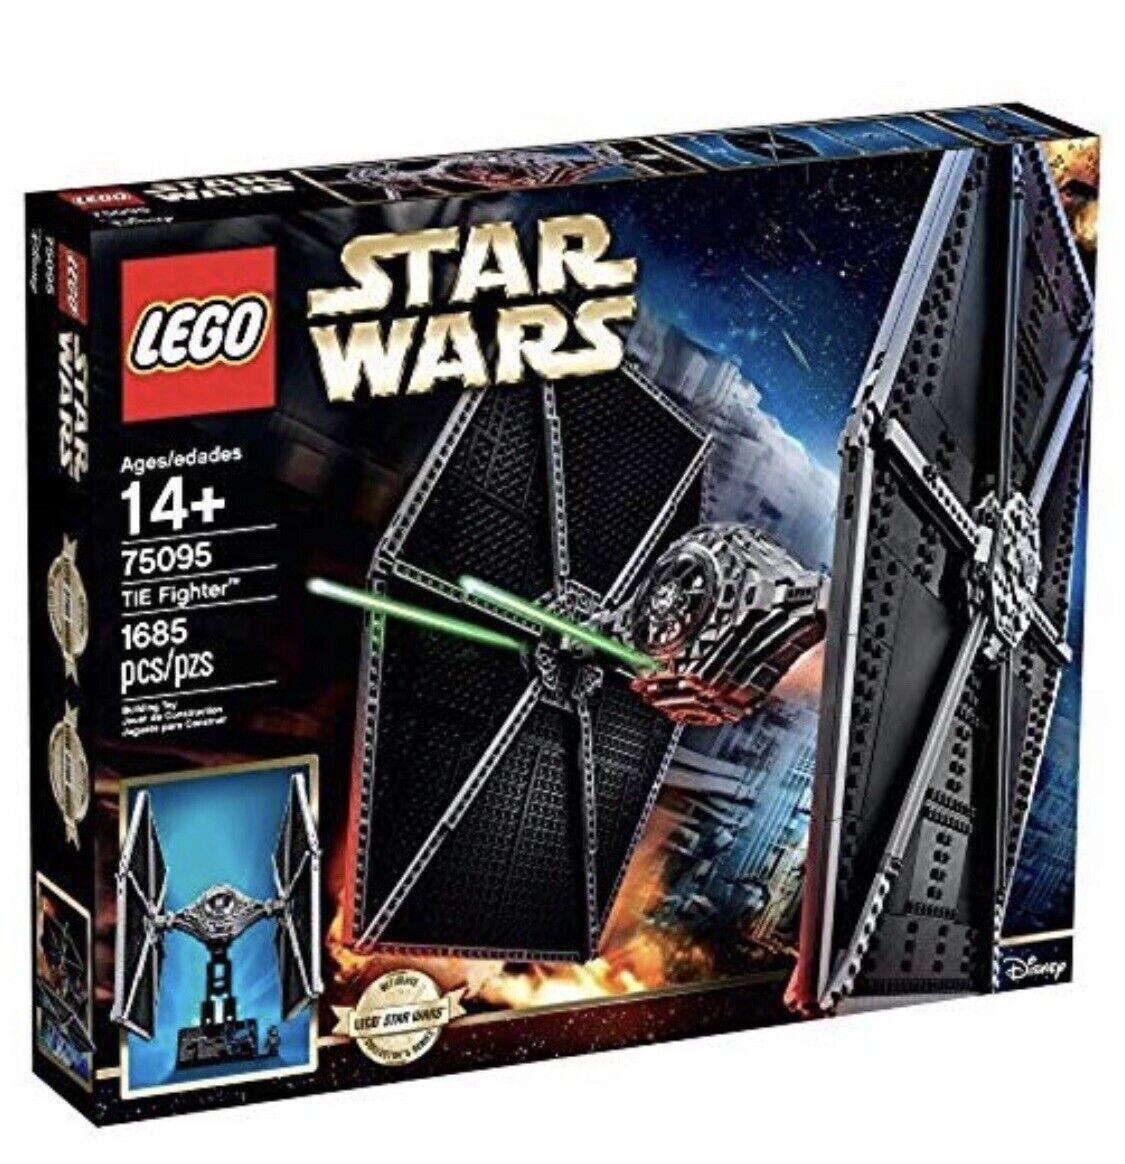 LEGO Star Wars UCS TIE Fighter (75095) New In Original Sealed Box - RETIrot